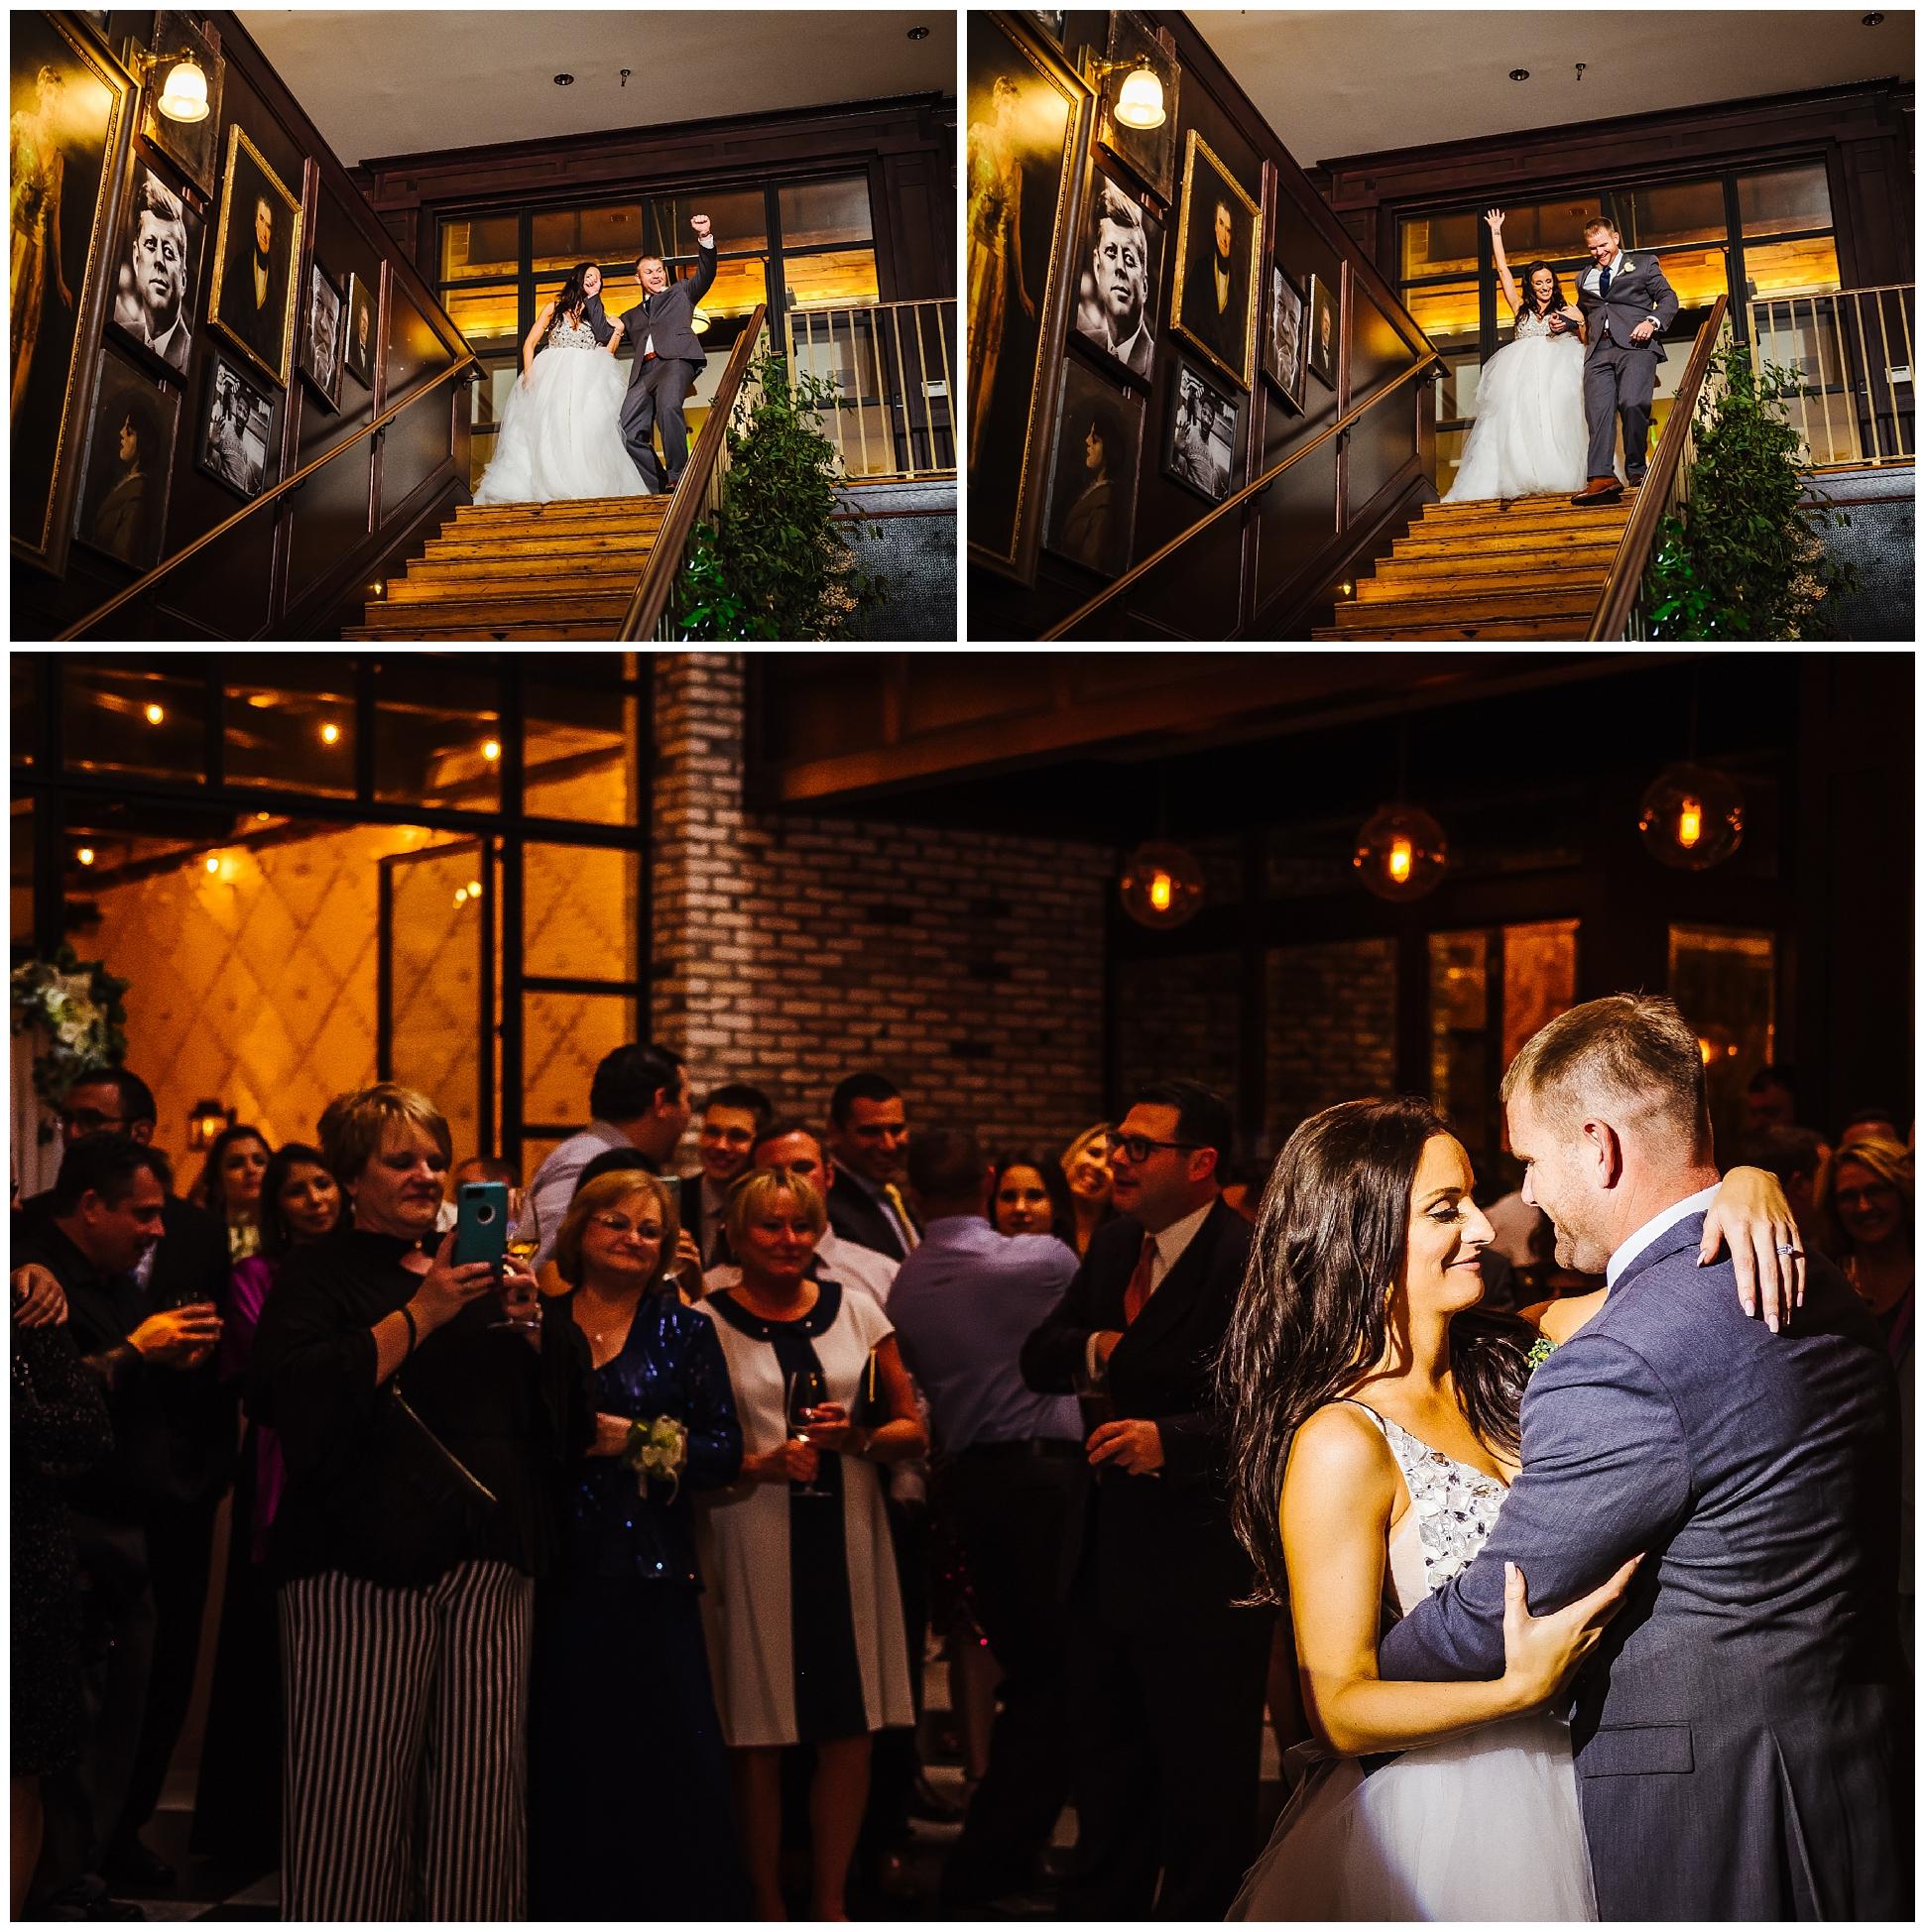 tampa-wedding-photographer-oxford-exchange-garland-candlelight-gold-hayley-paige_0053.jpg